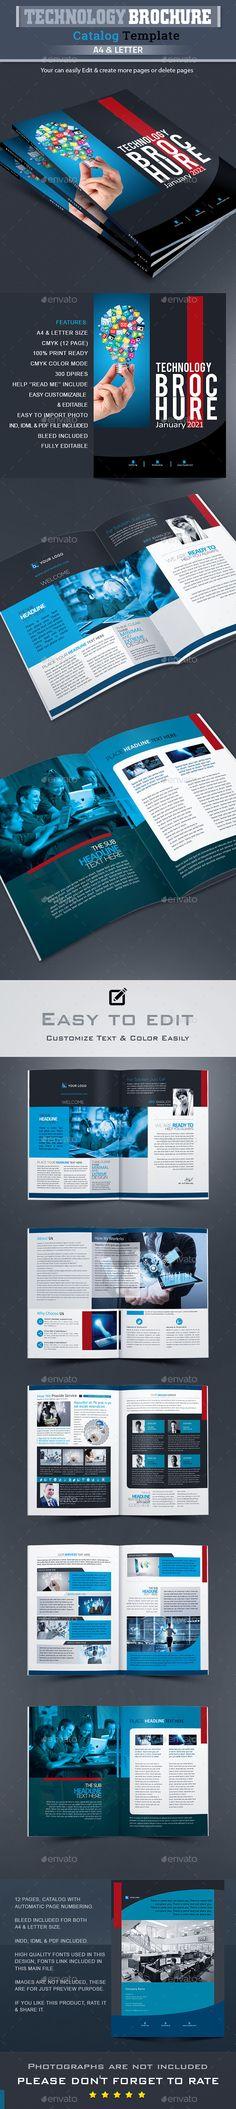 Creative Agency - A4 Portfolio Brochure Creative and Brochures - technology brochure template